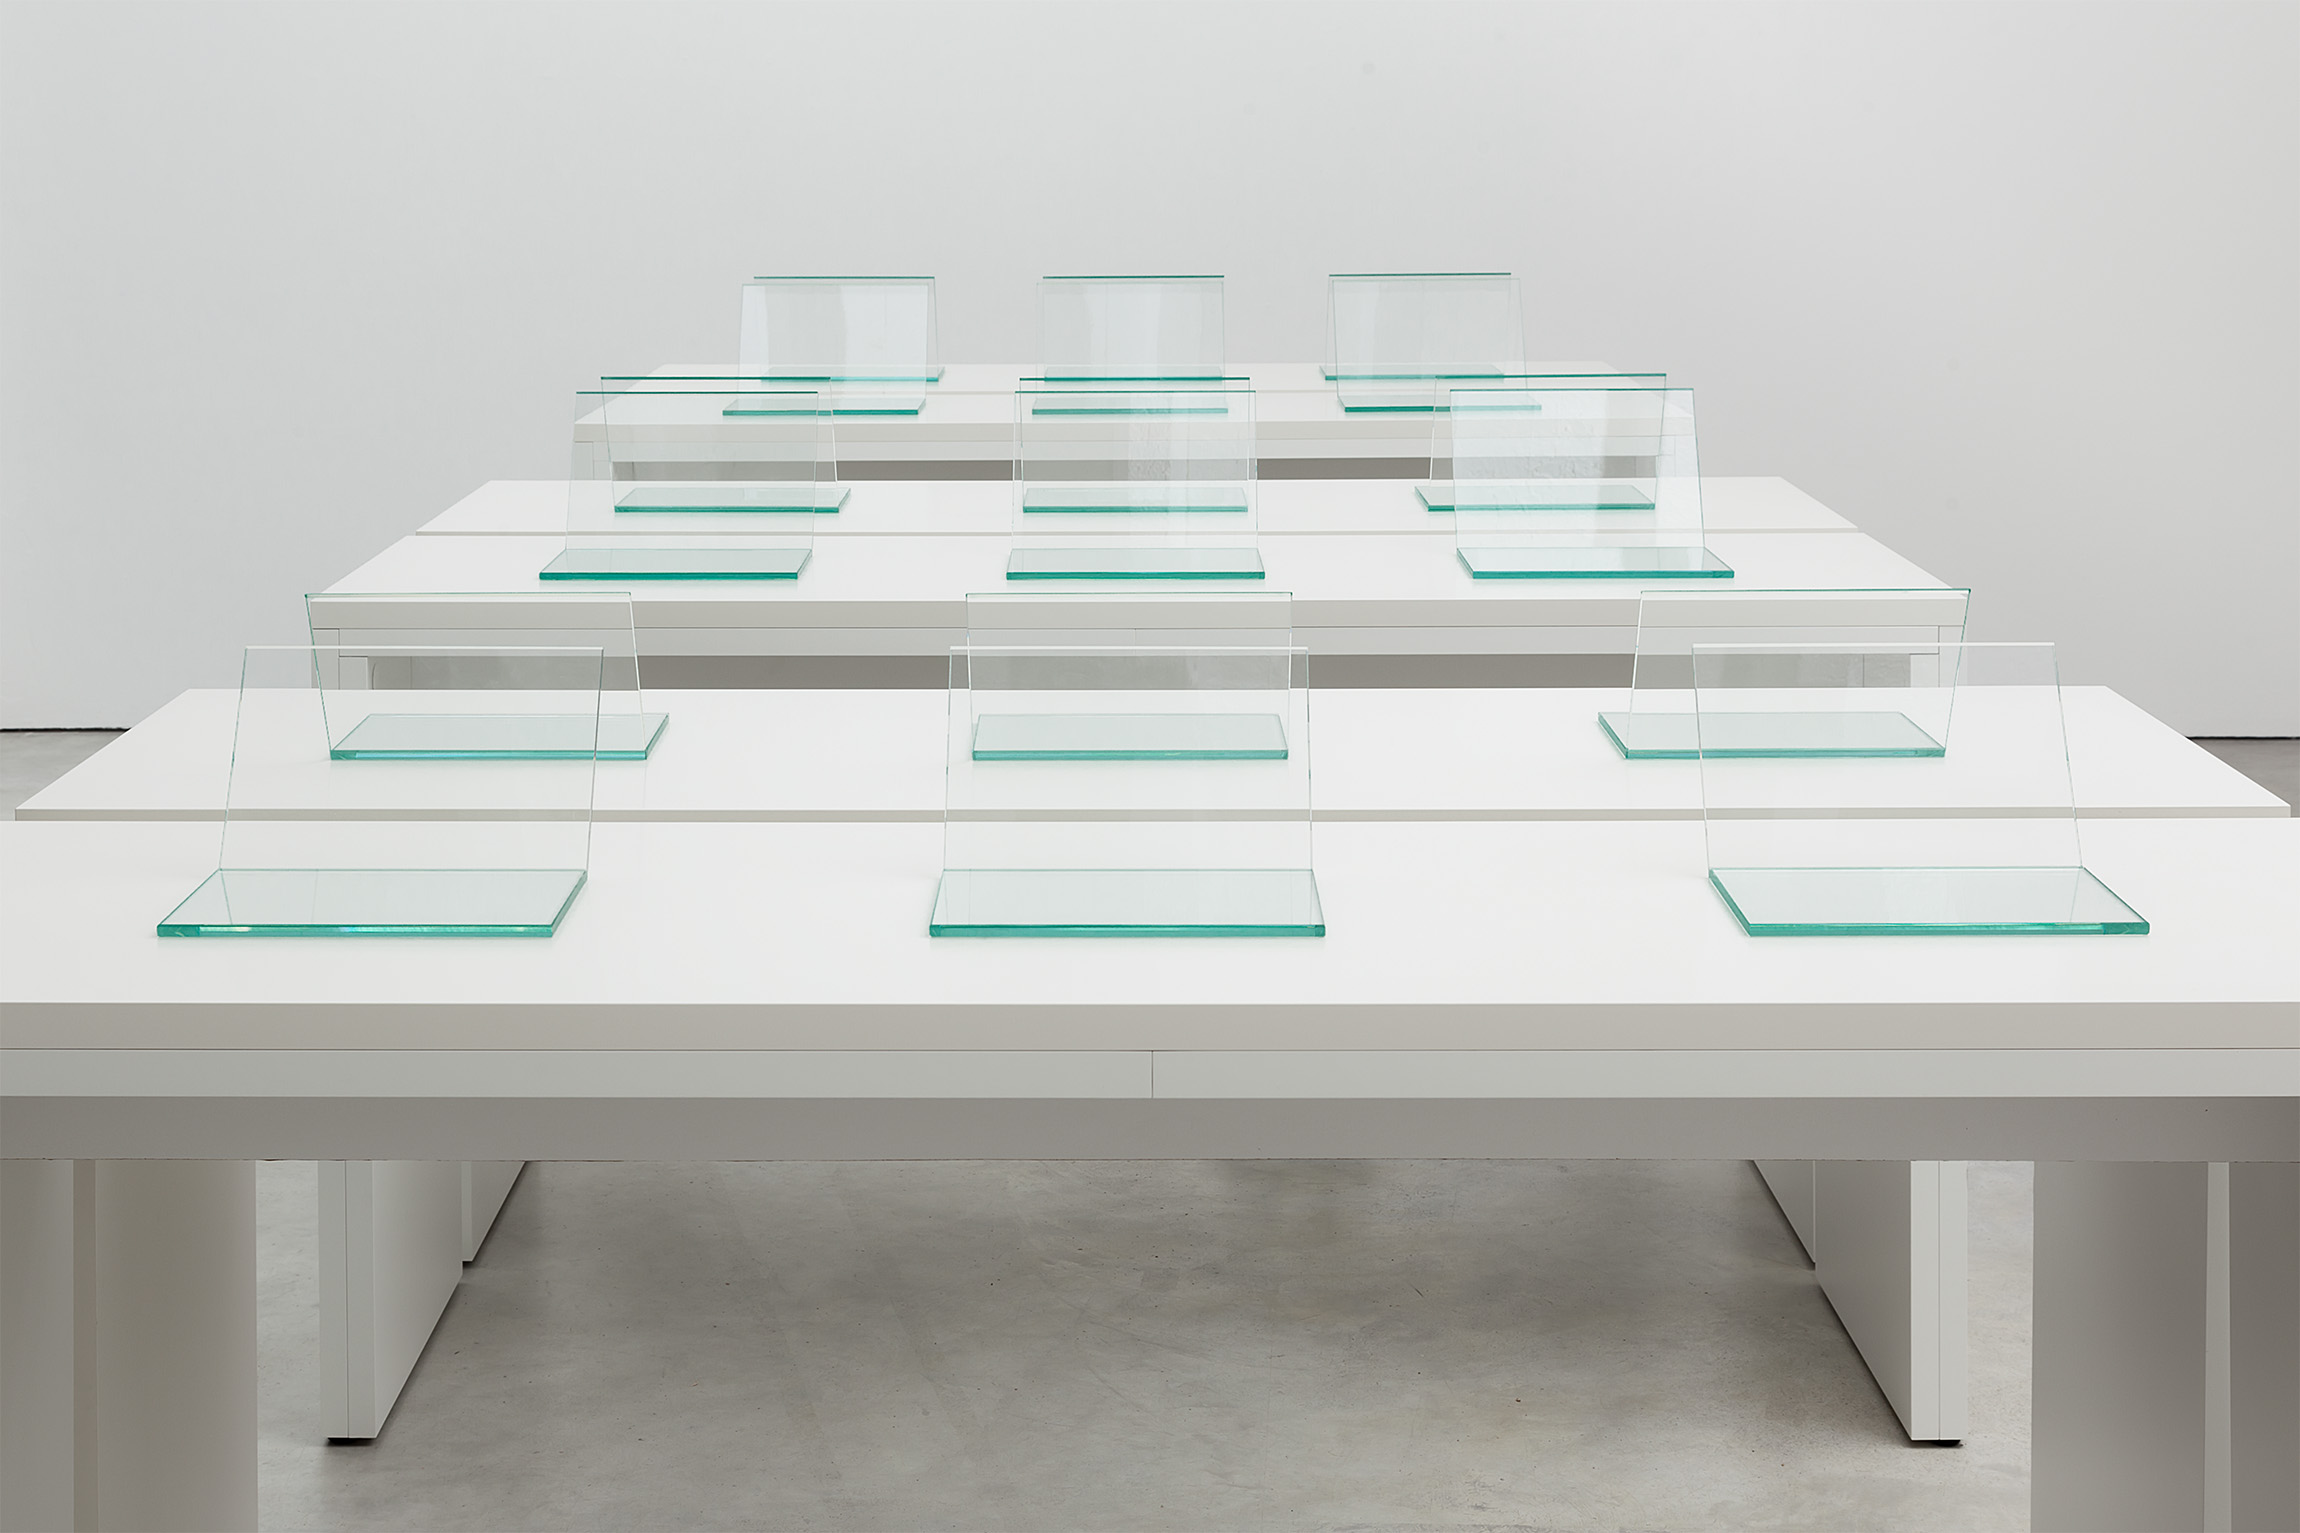 Installation view, Content is King! at Galerie Gebr. Lehmann, Berlin, 2014